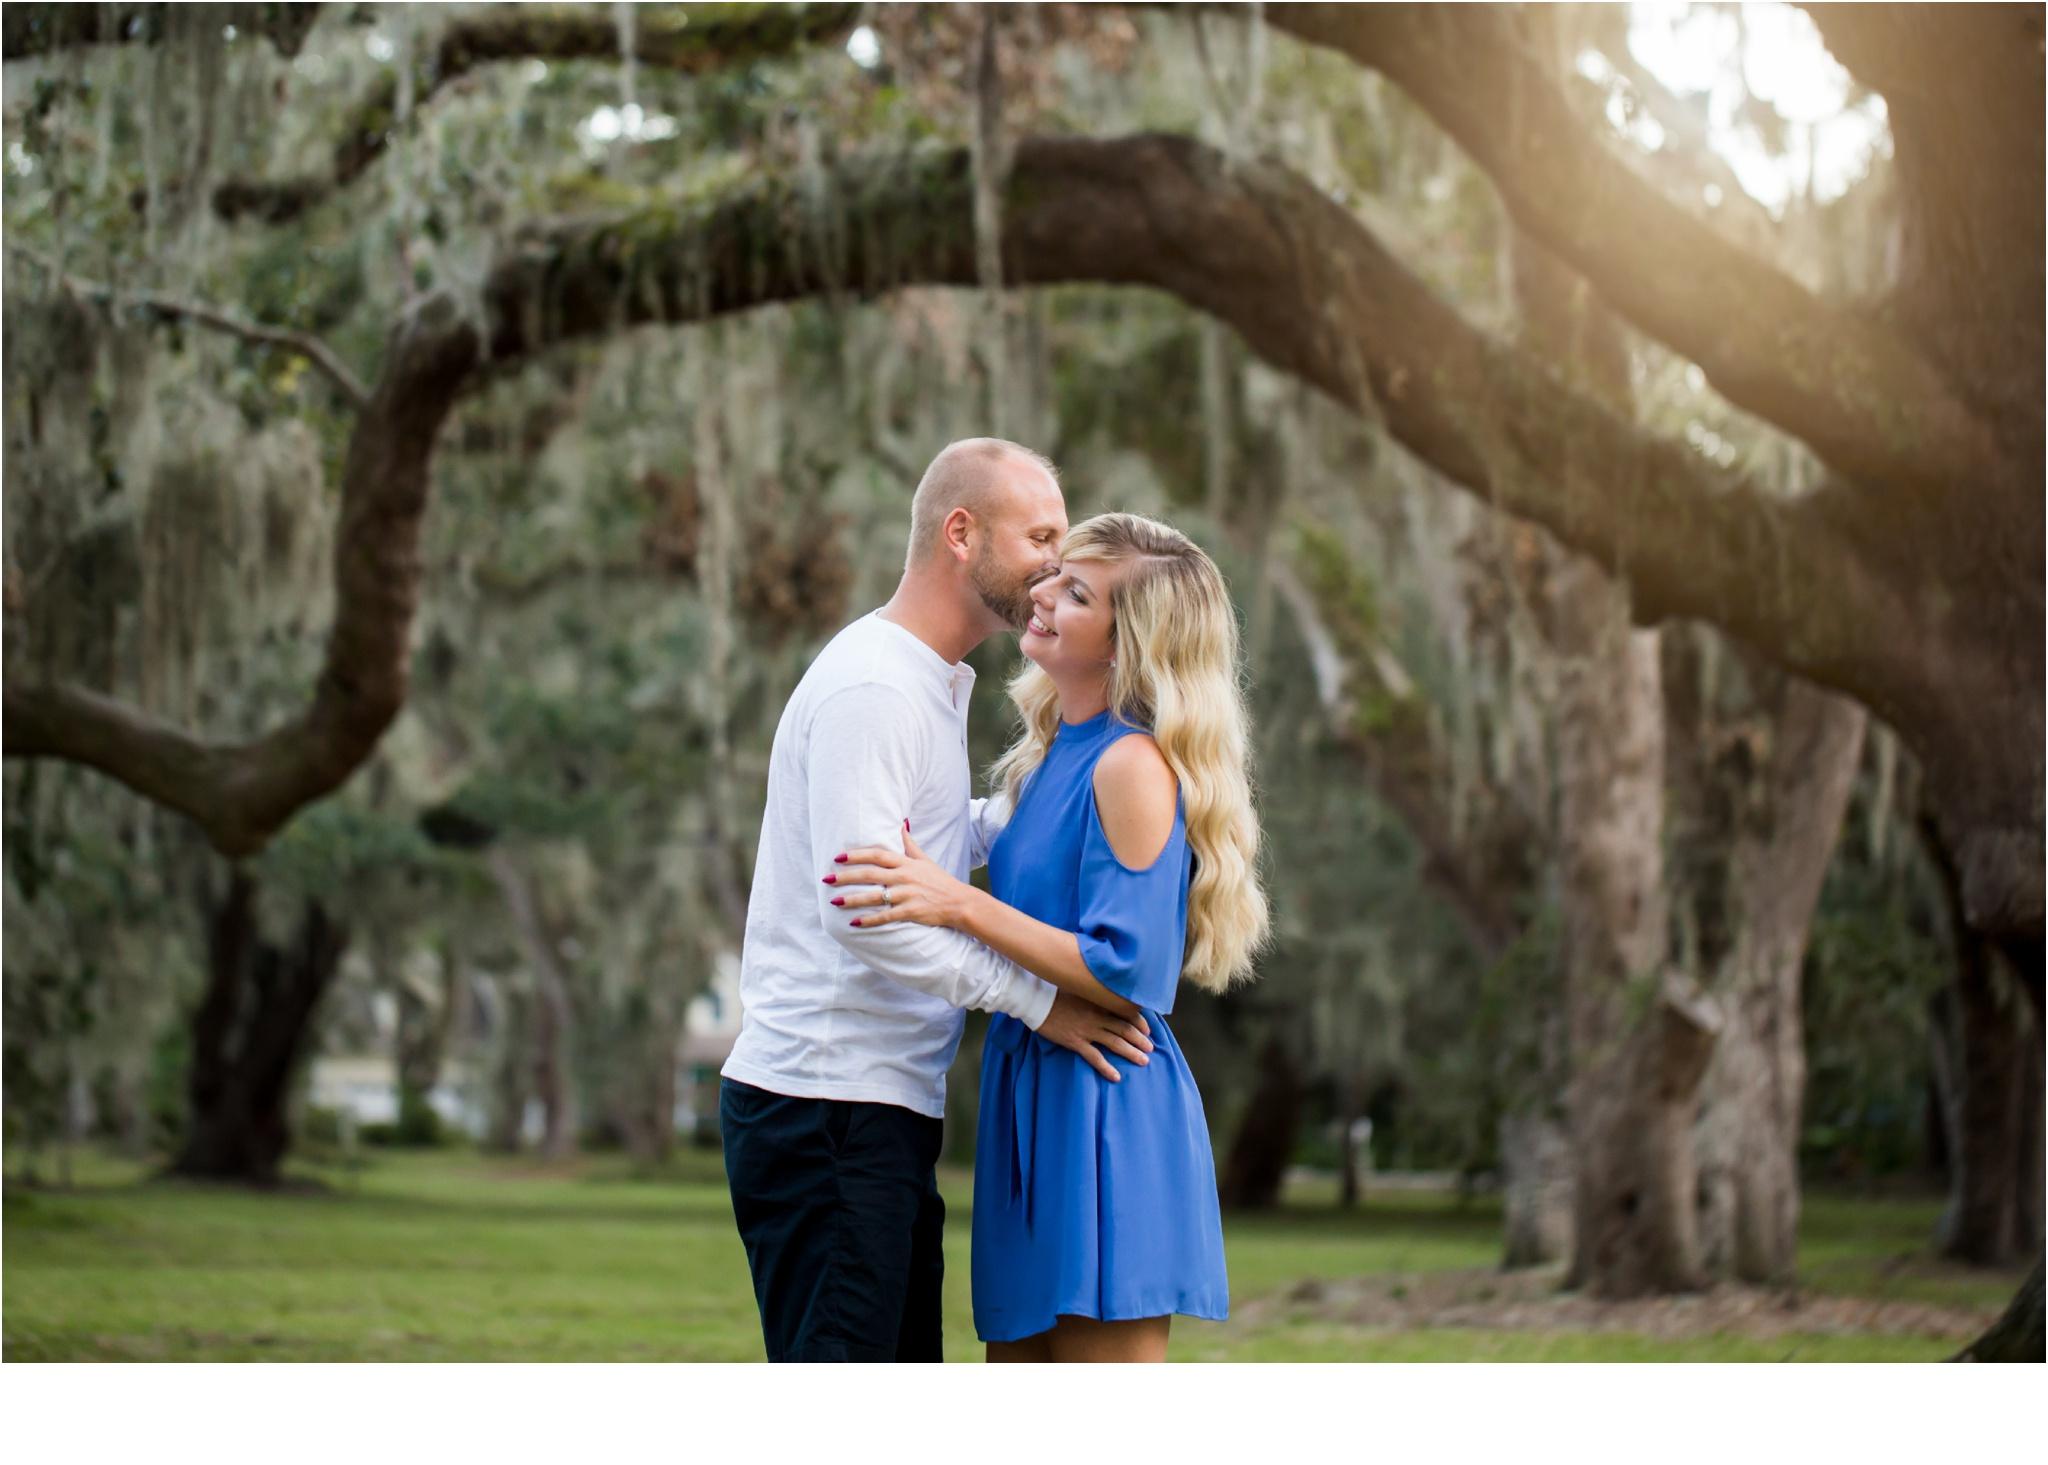 Rainey_Gregg_Photography_St._Simons_Island_Georgia_California_Wedding_Portrait_Photography_0255.jpg